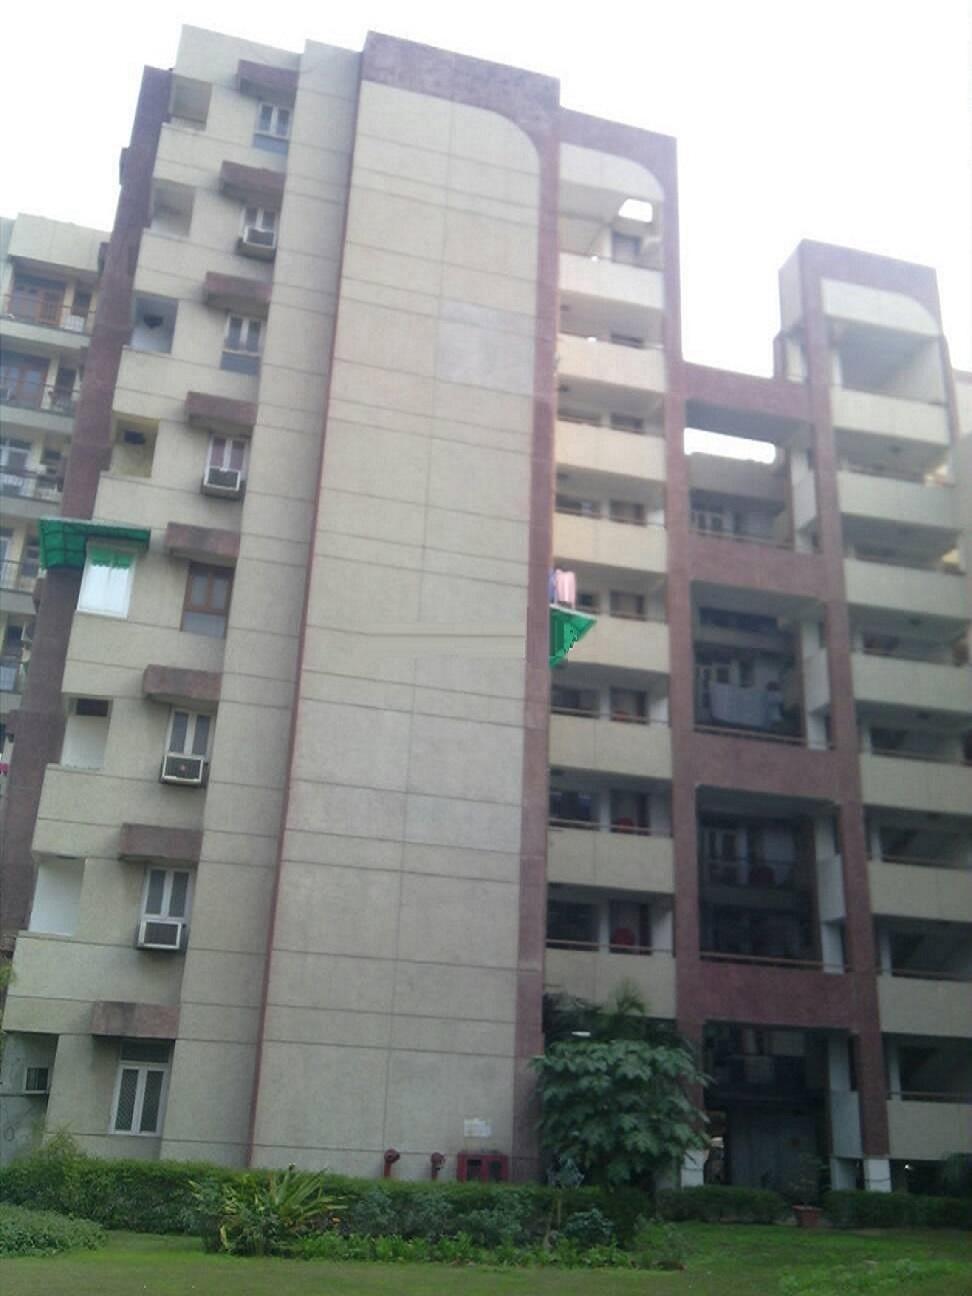 ganpati apartments delhi project tower view1